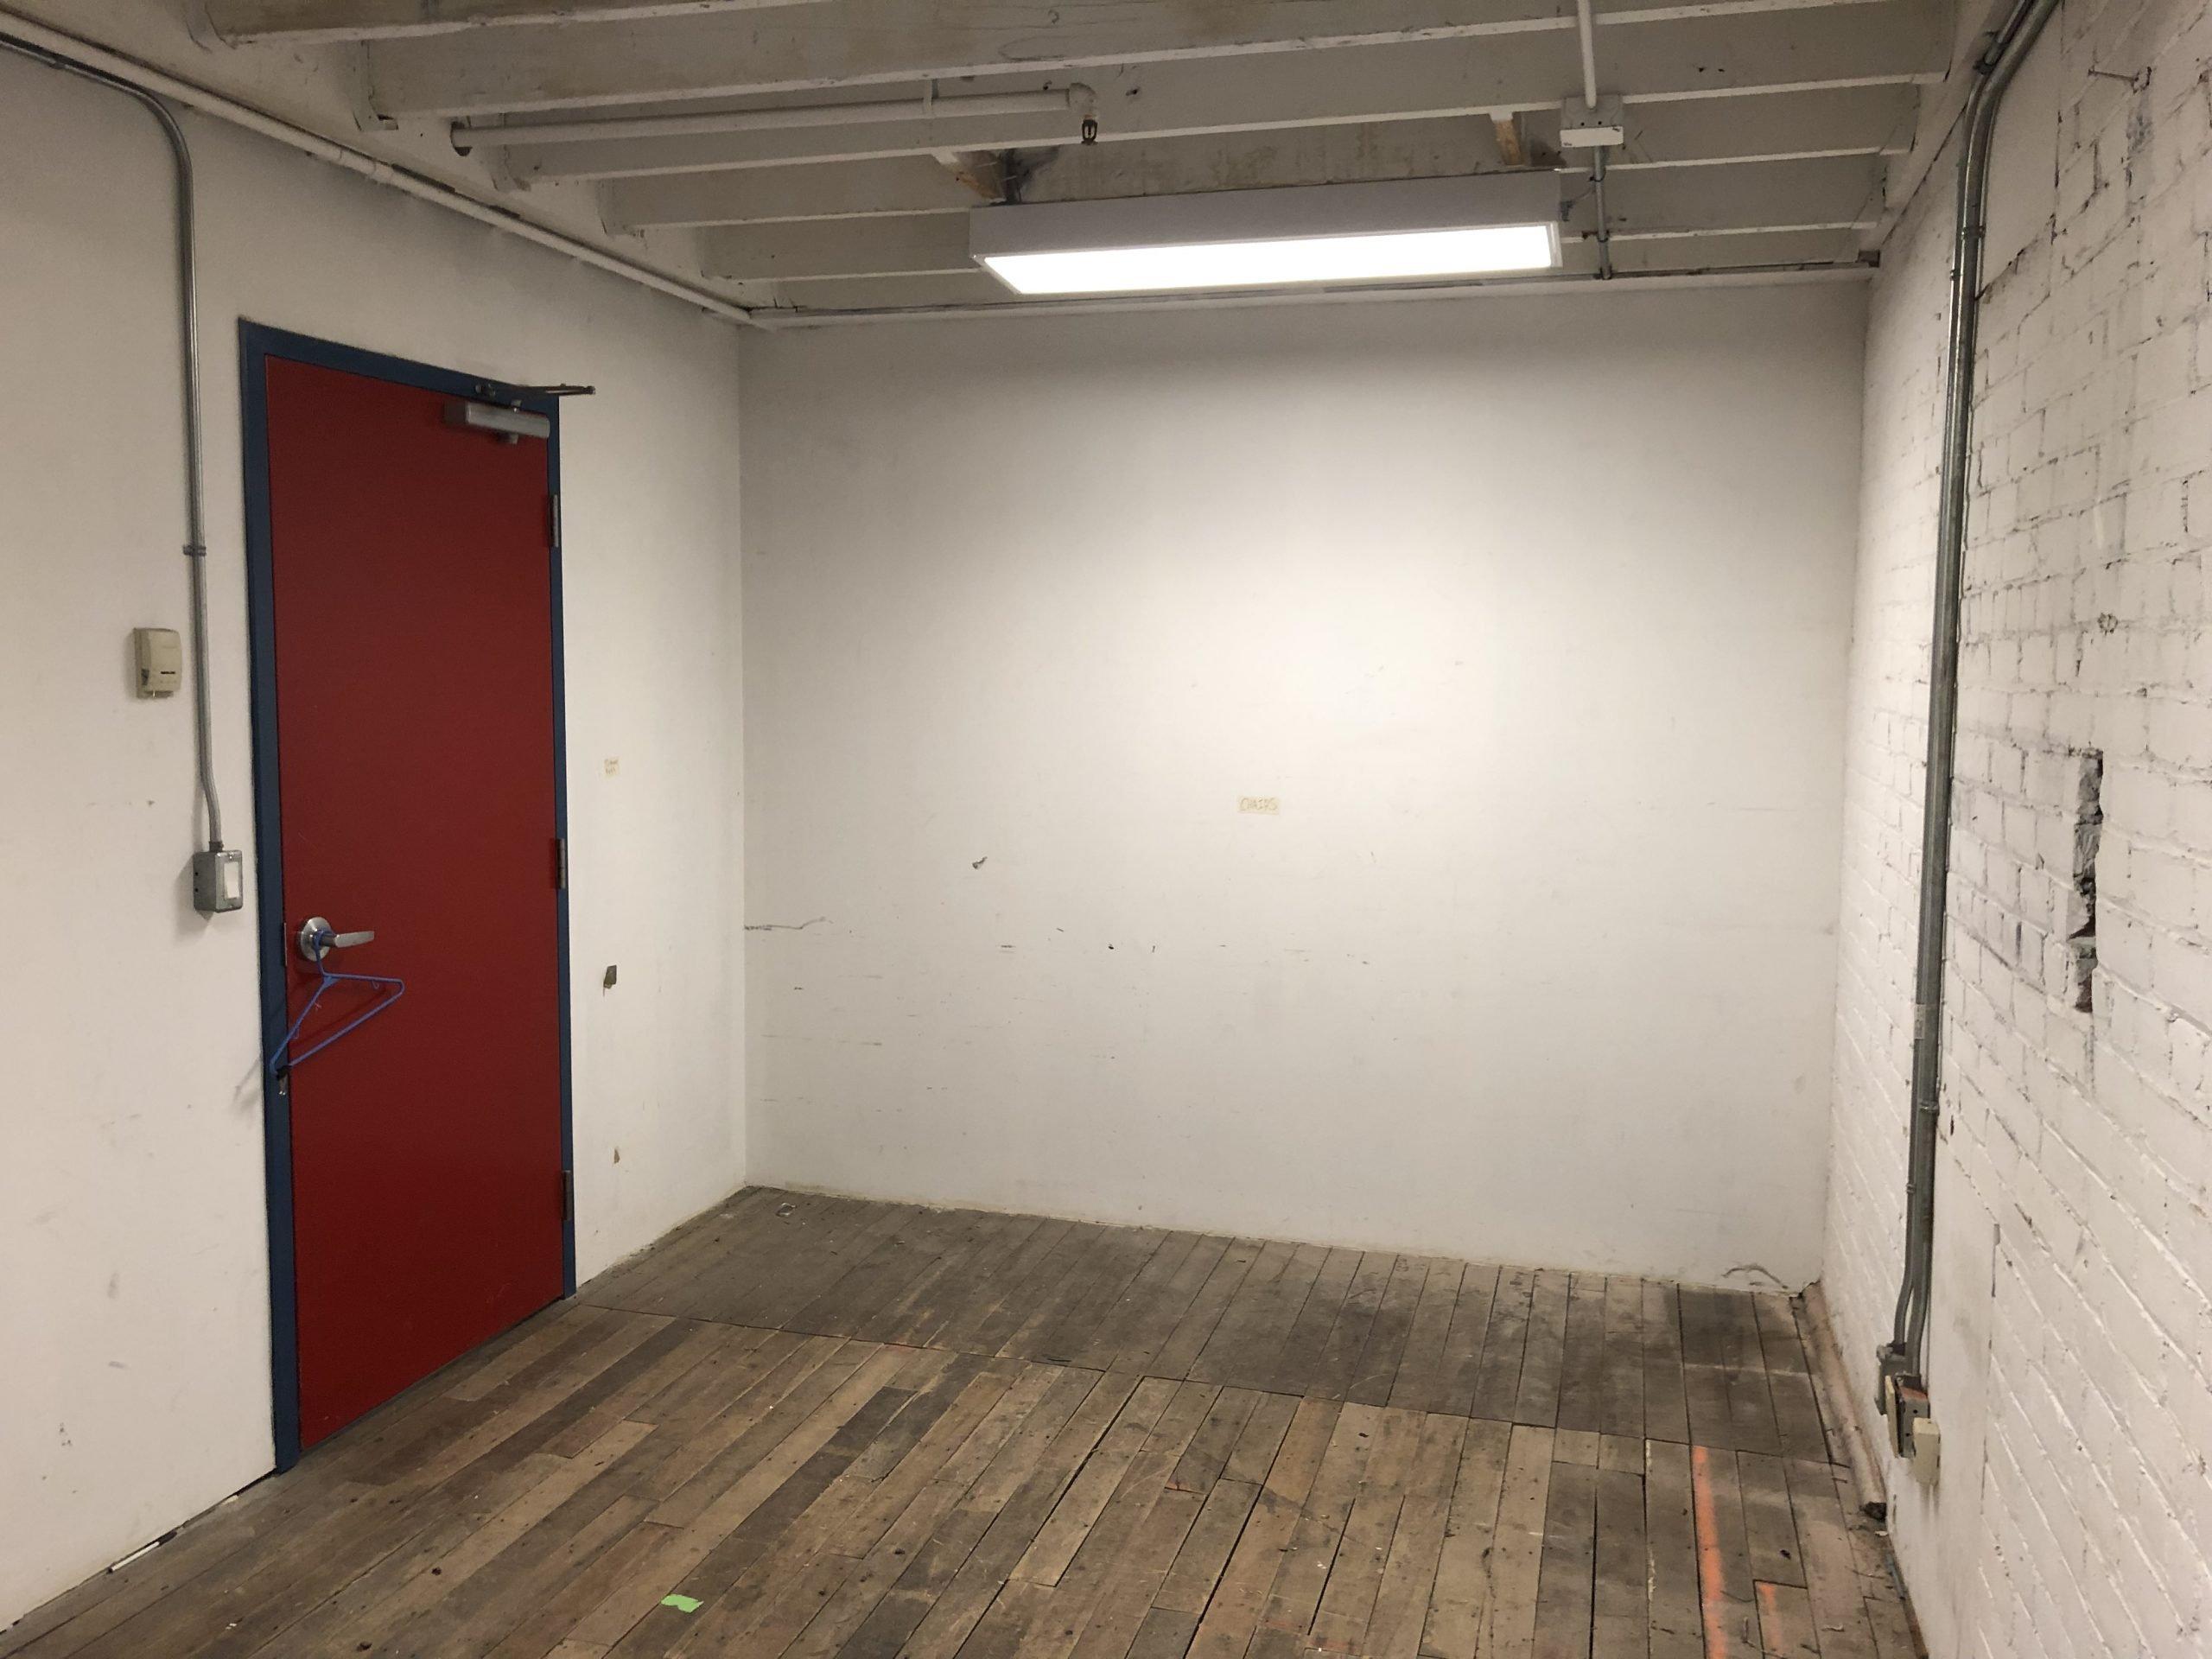 Private Artist Studio Or Office Space At Artscape Distillery Studios